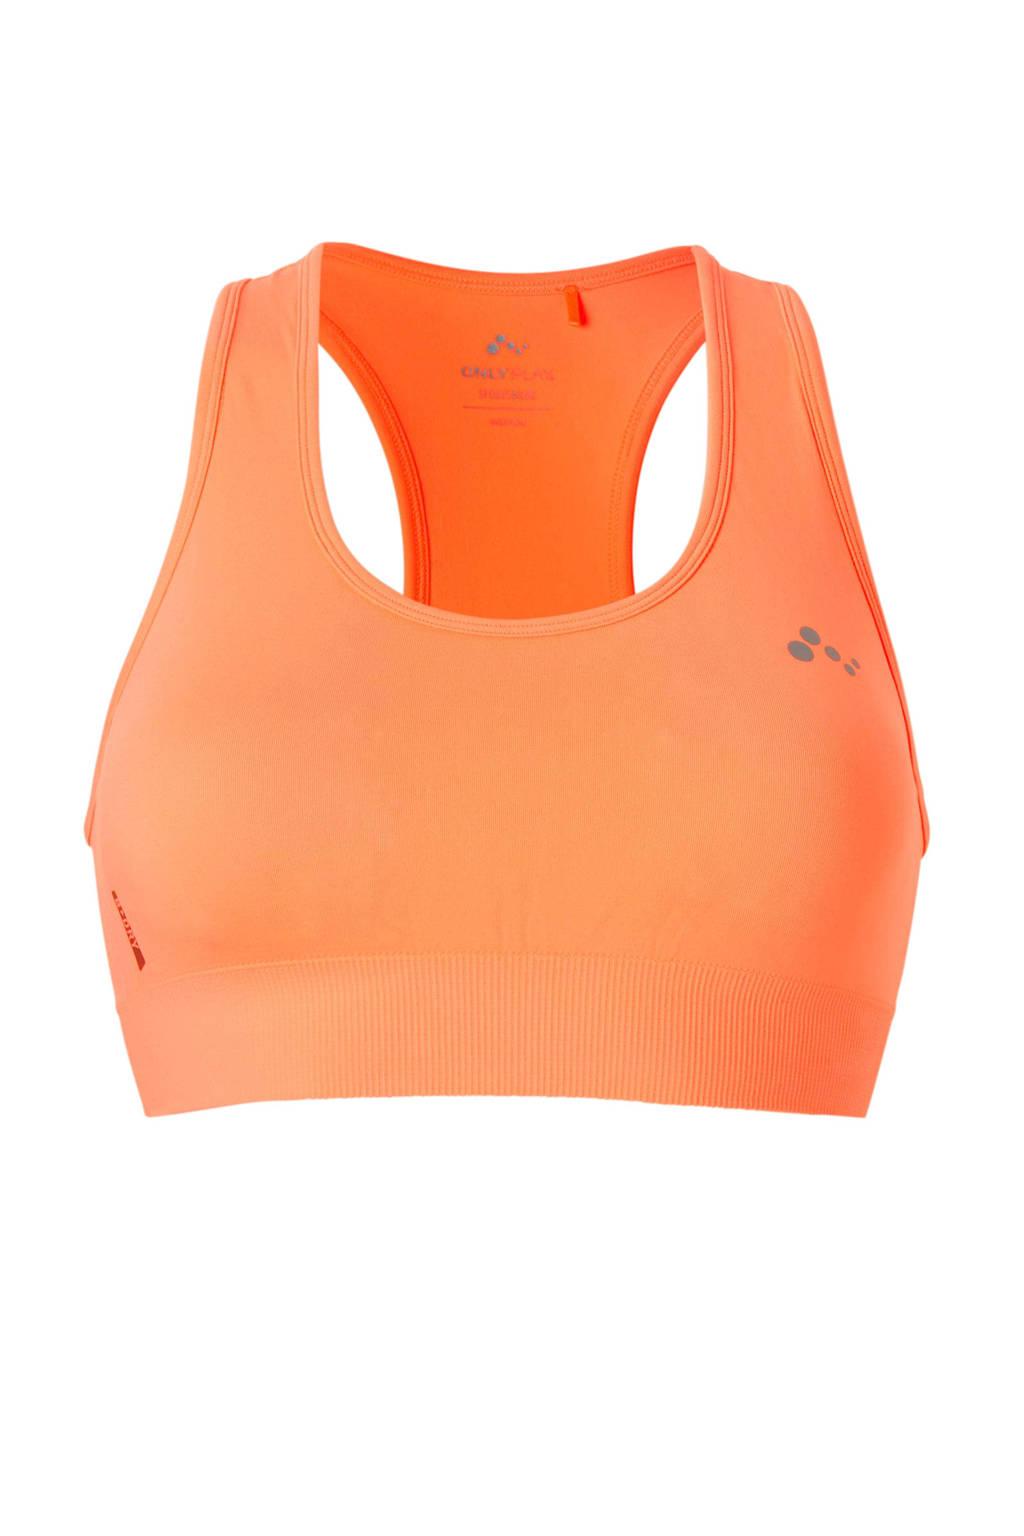 ONLY PLAY level 1 sportbh ONPDAISY neon oranje, Neon oranje